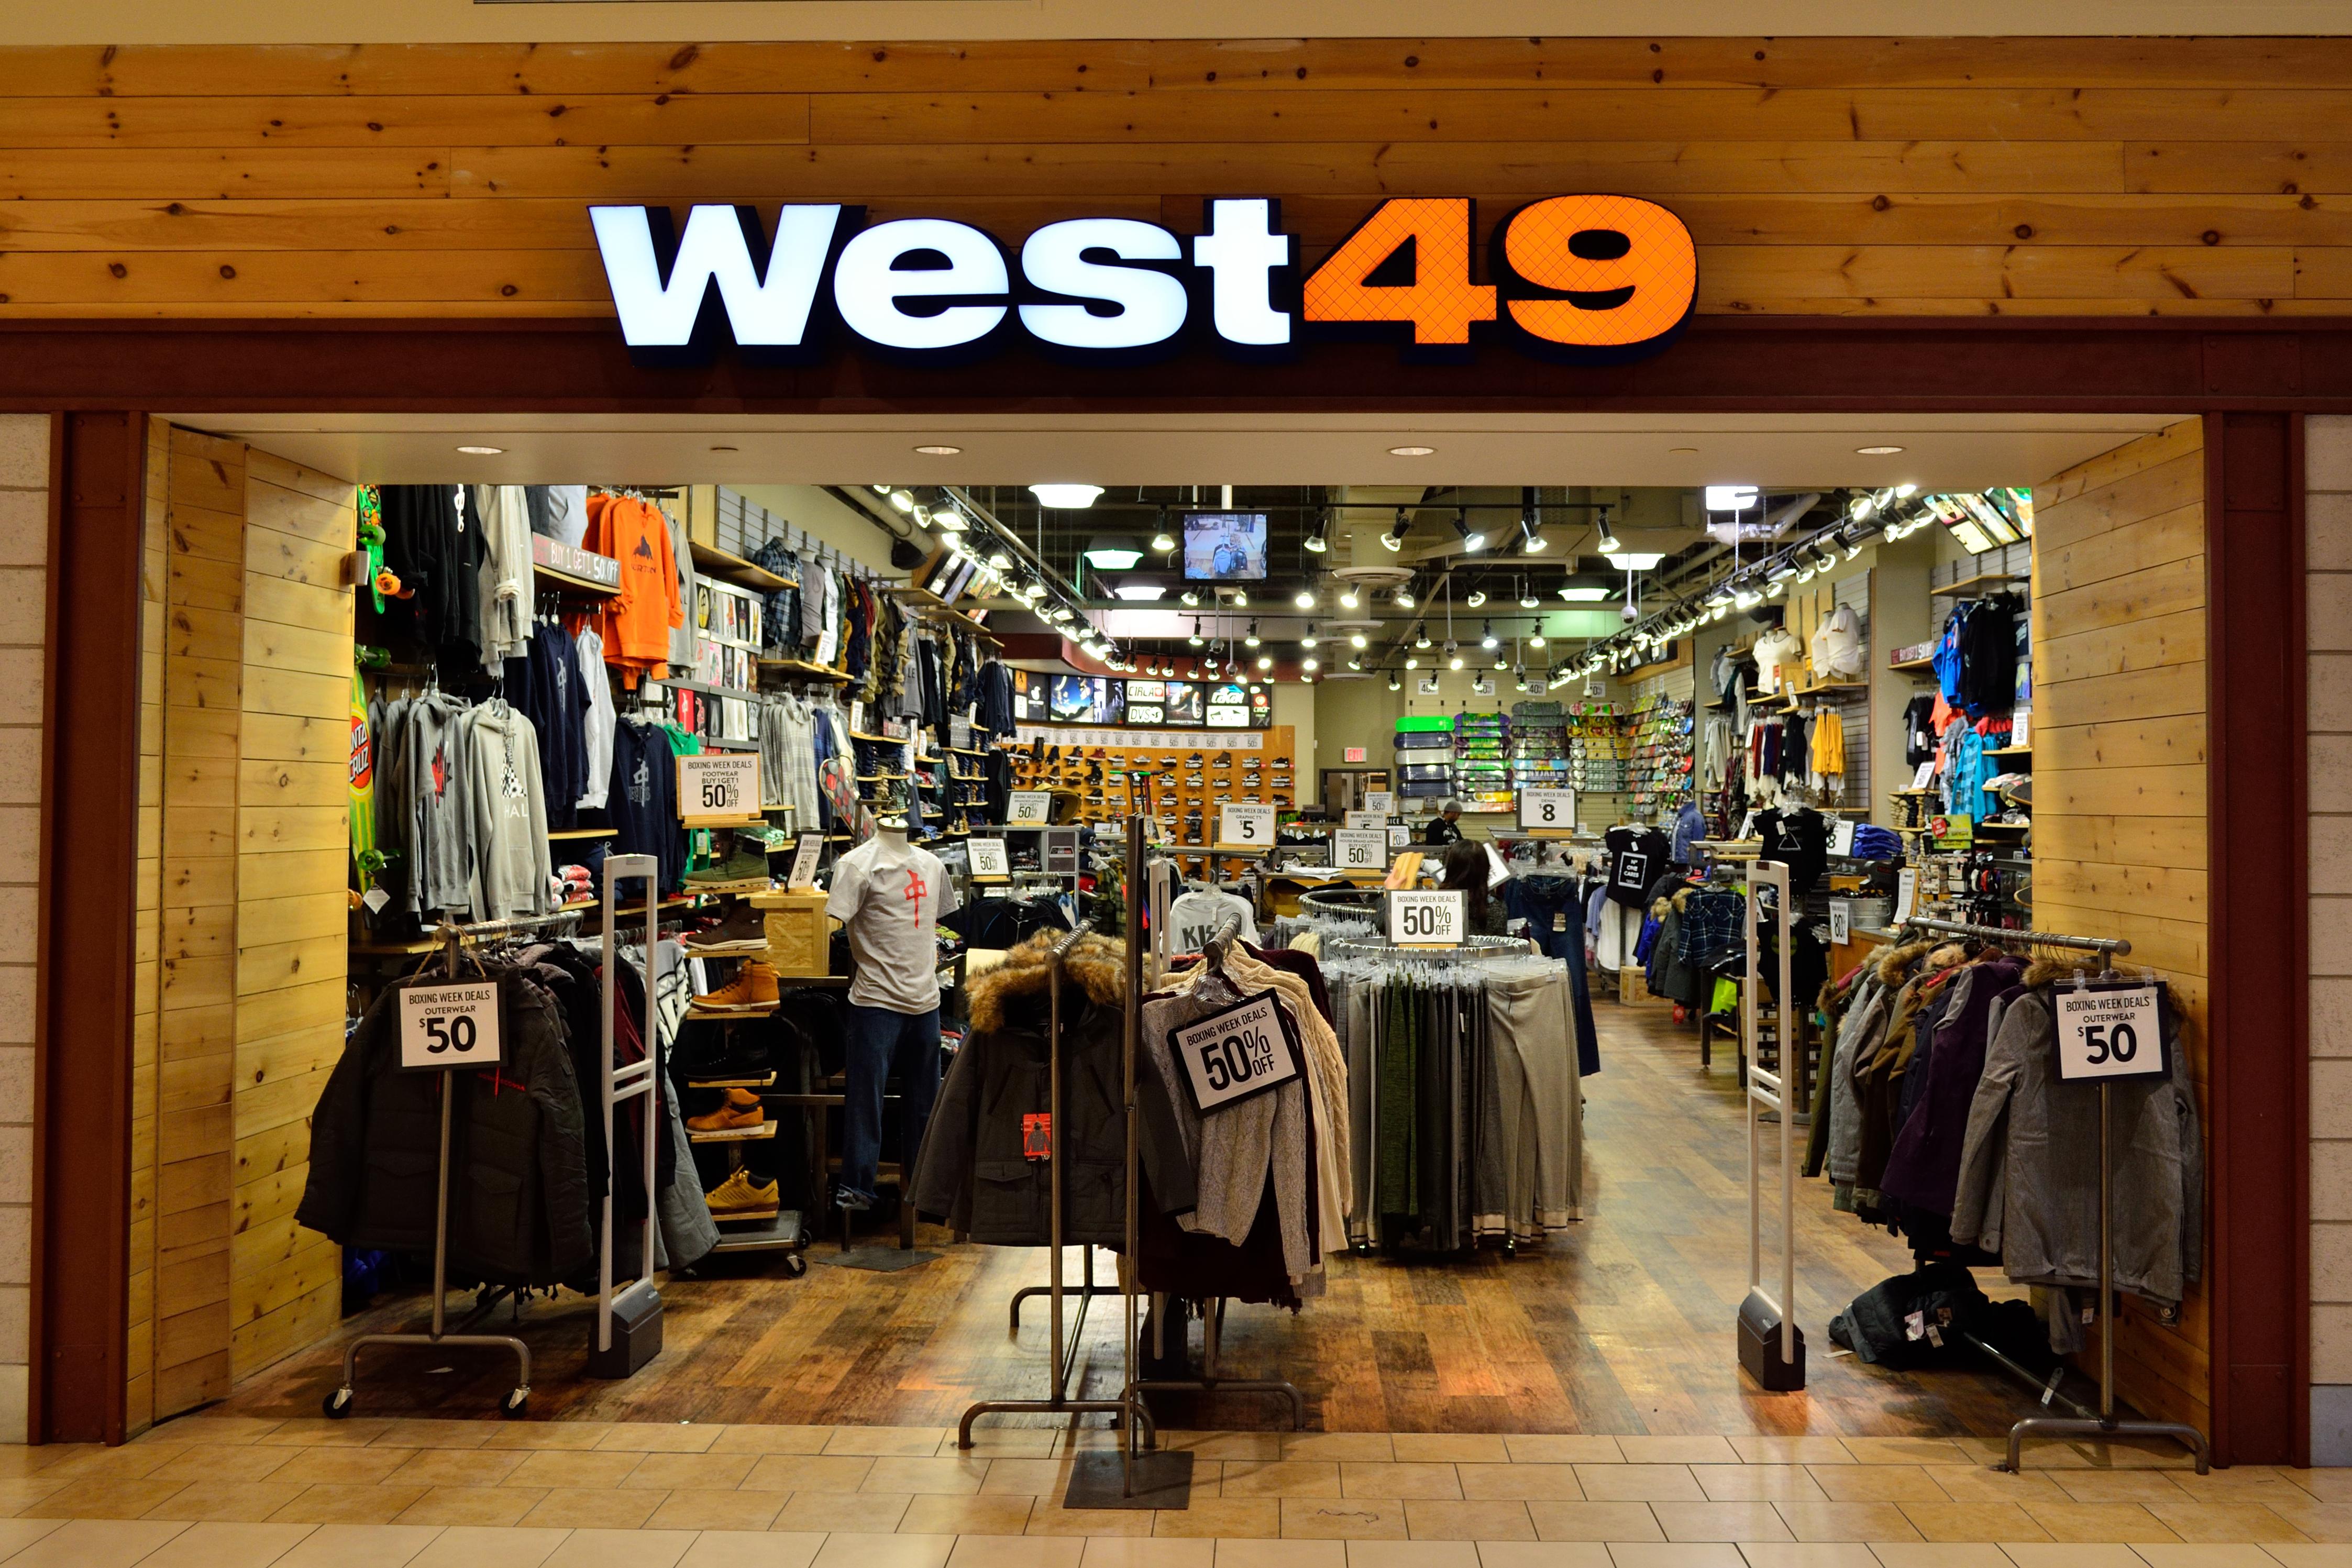 West 49 - Wikipedia